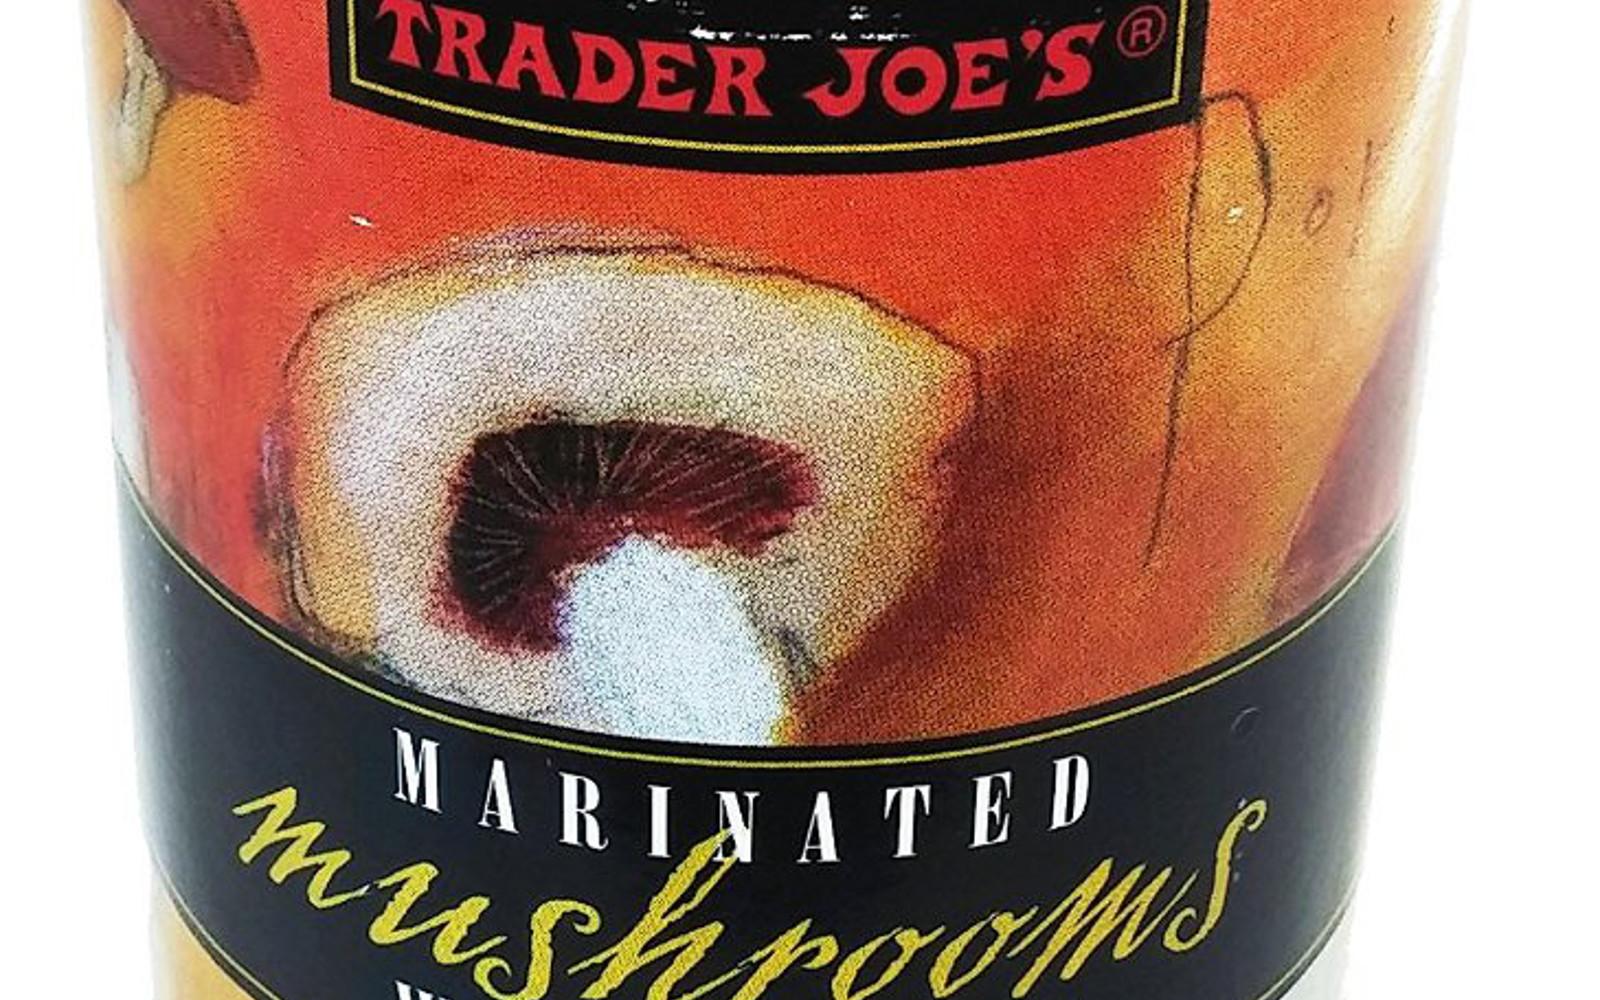 Dried Porcini Mushrooms Trader Joe'S  Slices Powder Pâté and More 15 Mushroom Products